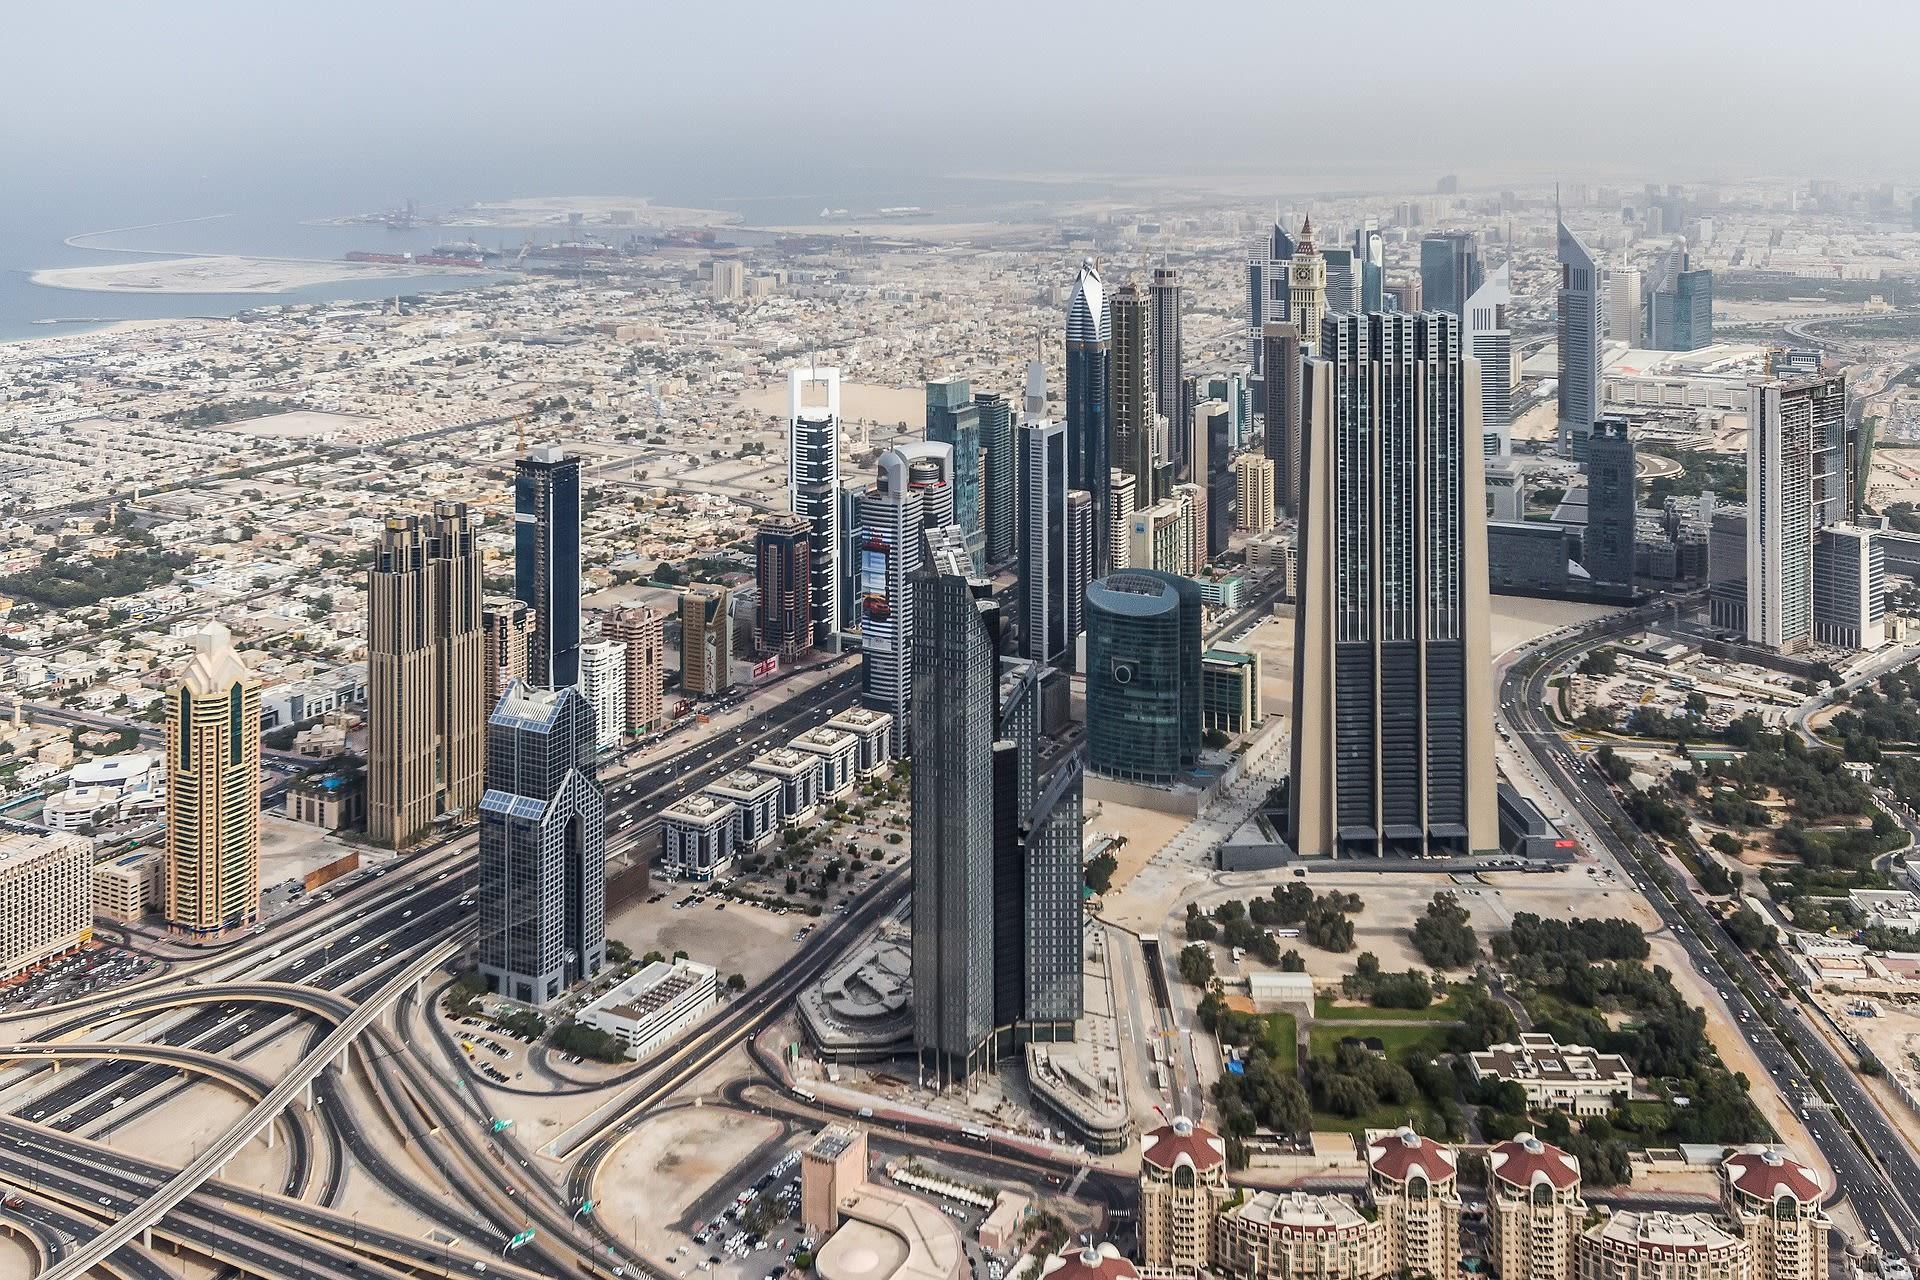 Dubai's Plans for $2 Billion Tech-driven Mega Mall